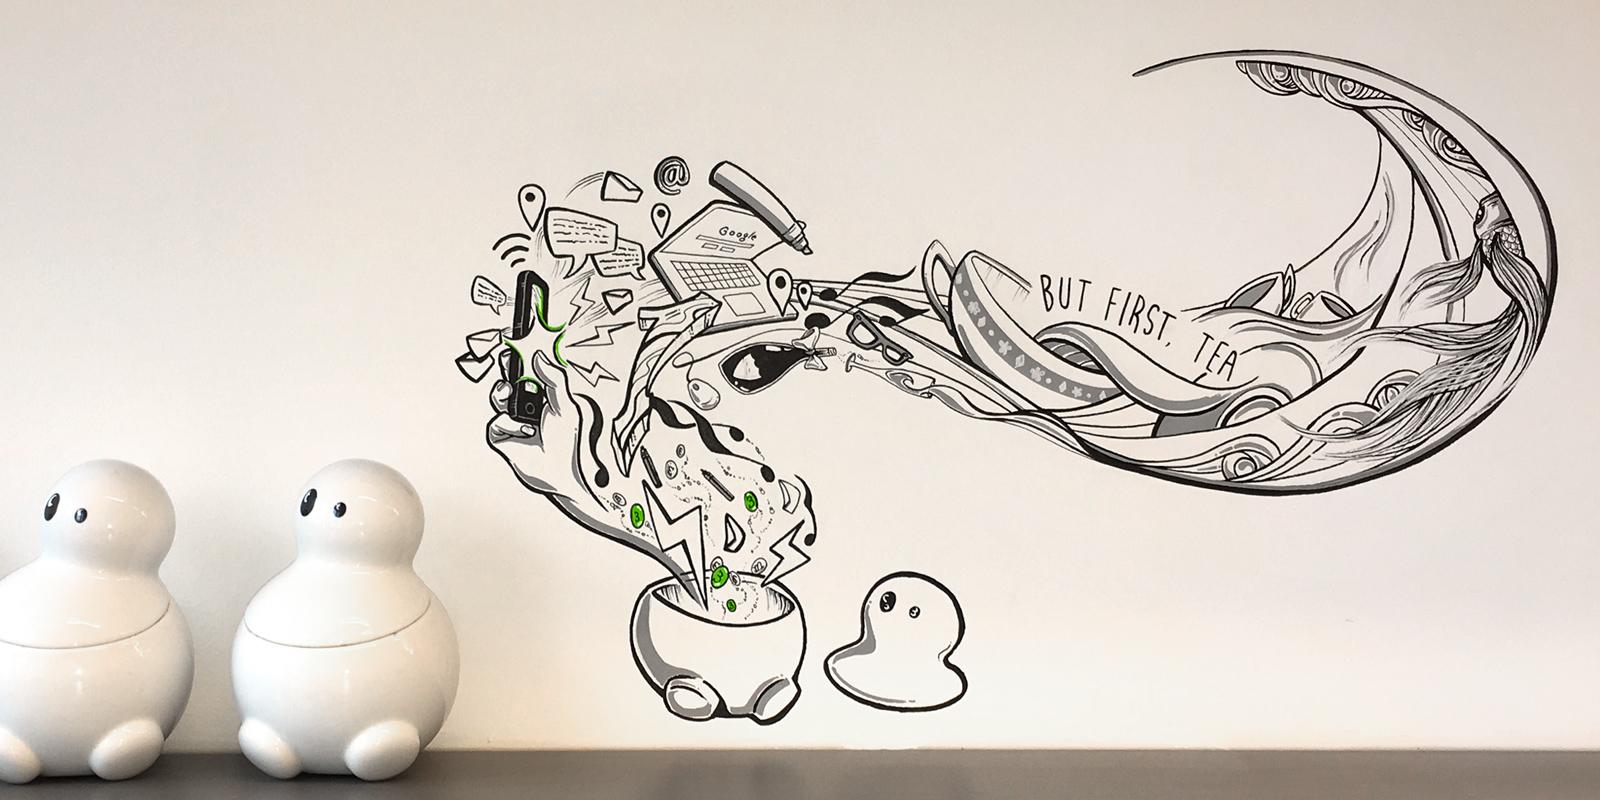 https://bulletonastring.com/wp-content/uploads/2021/03/ca3_bulletonastring_office_illustrations_but_first_tea.jpg